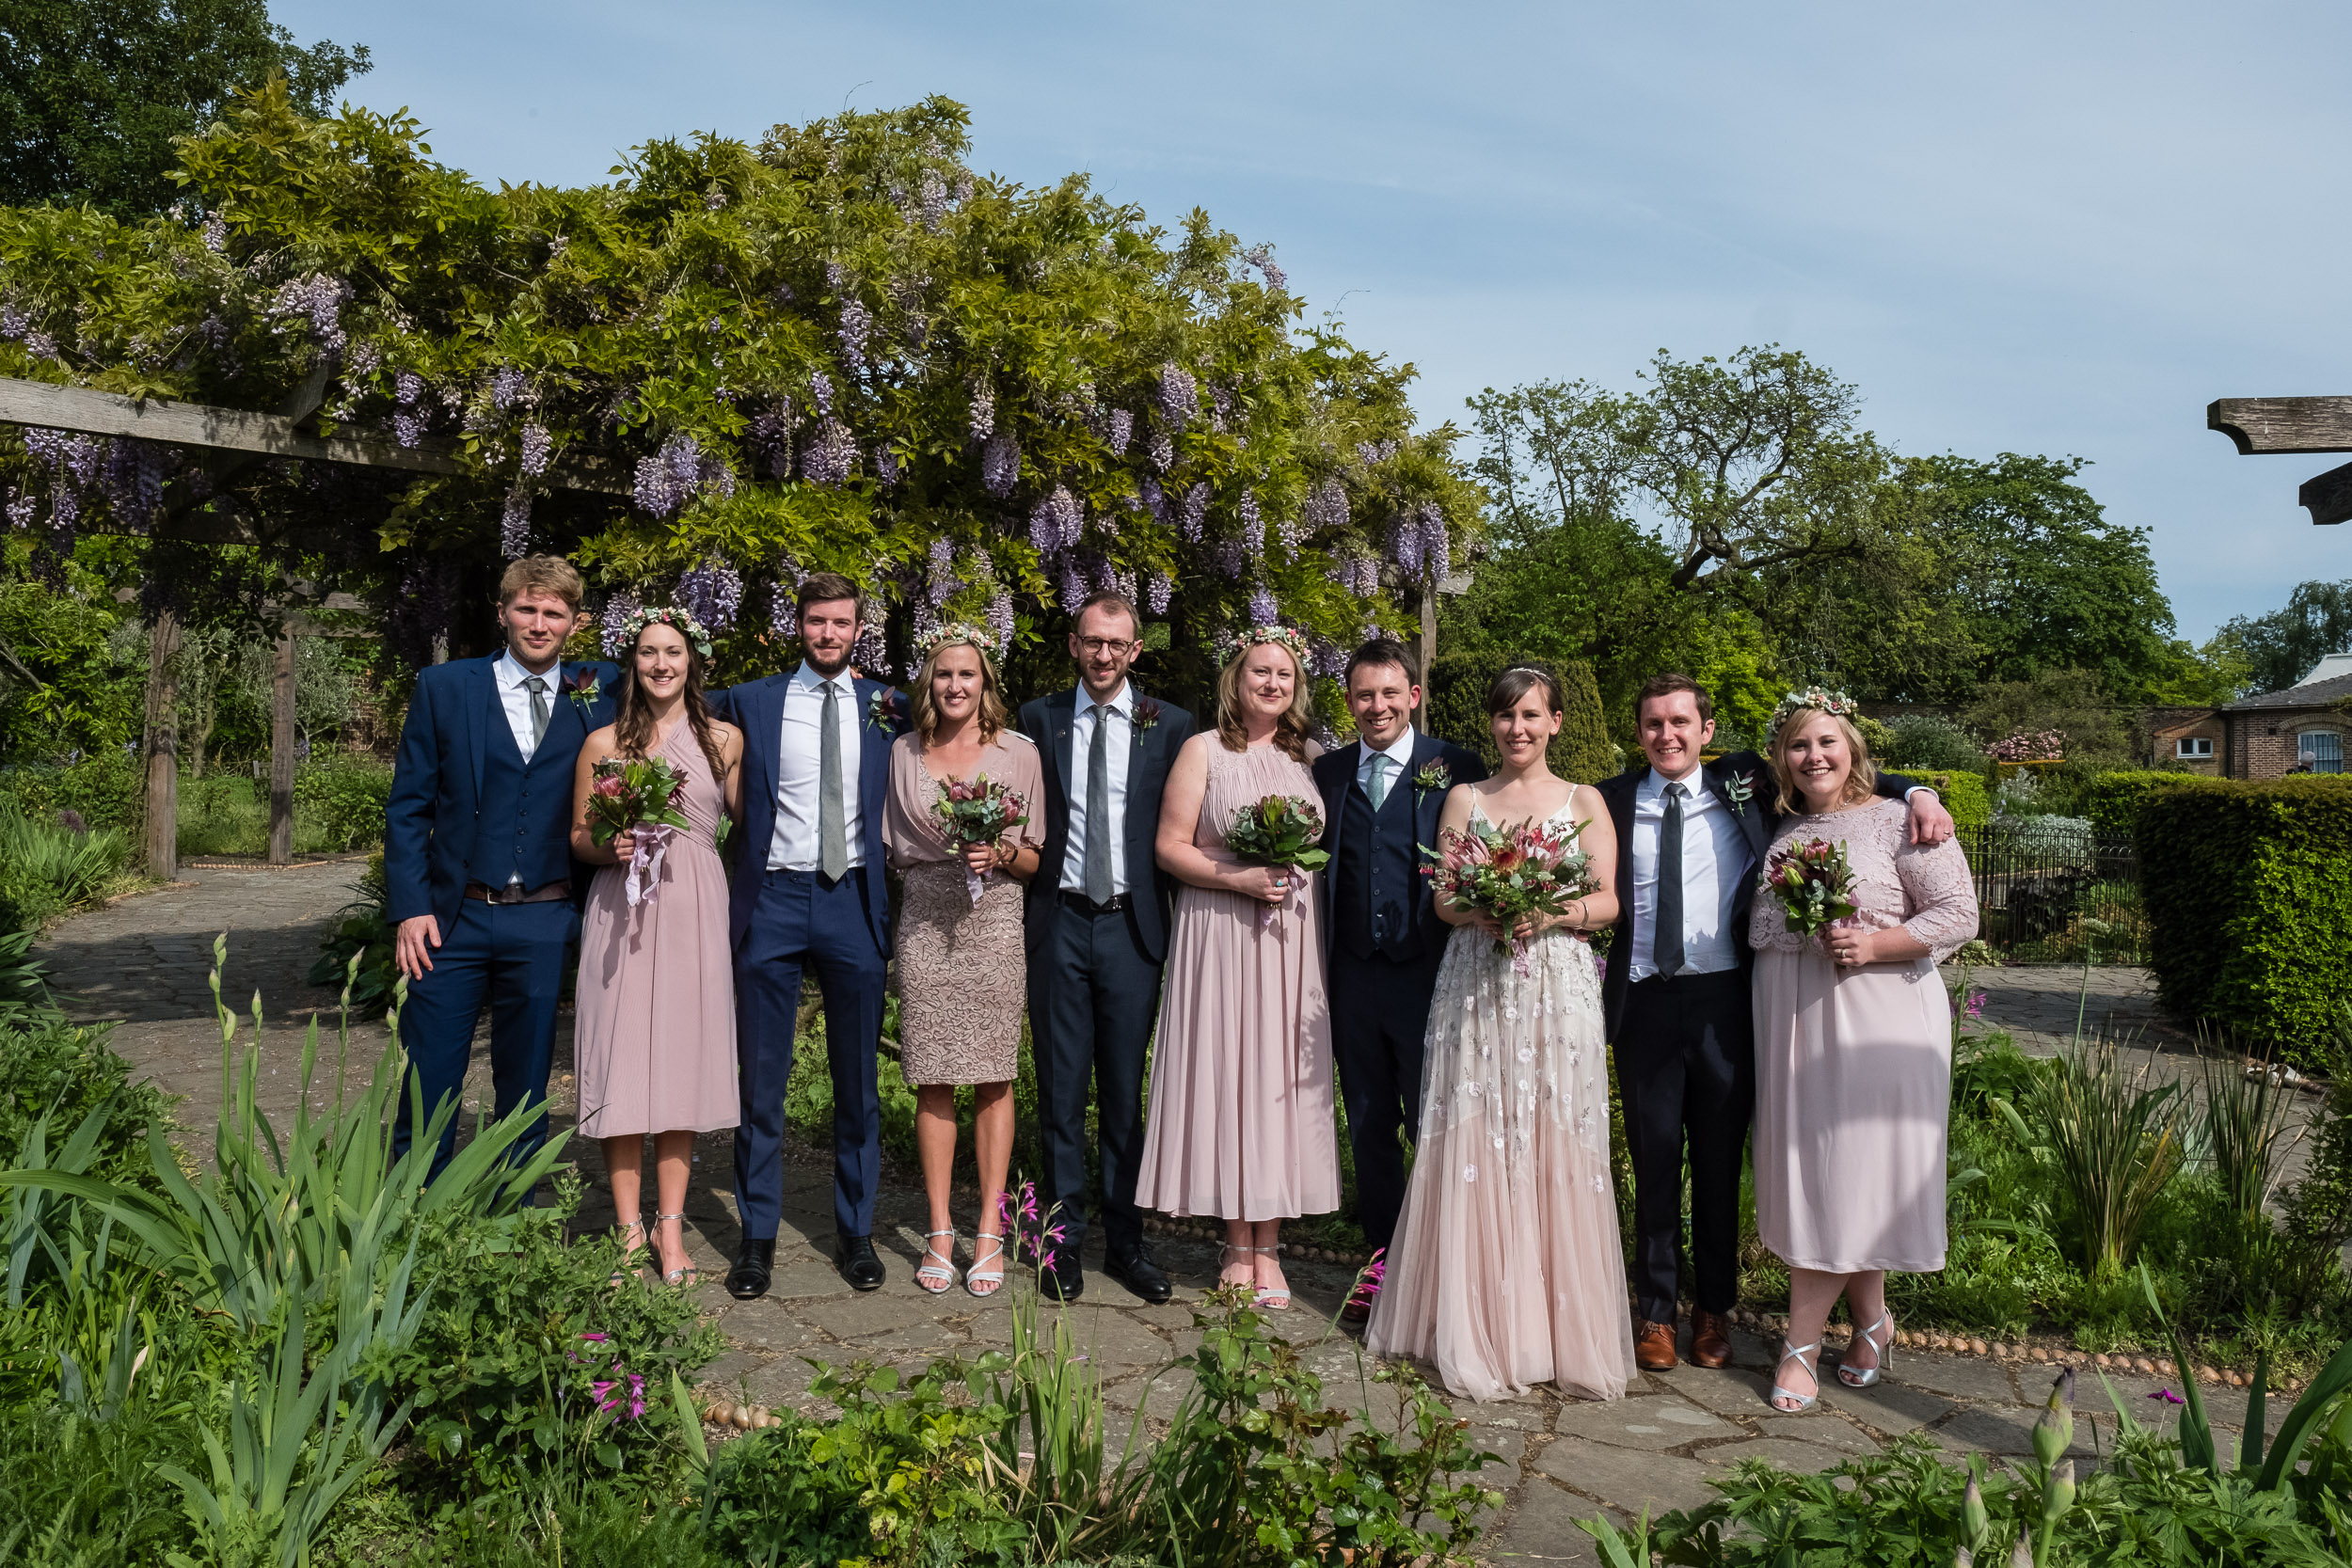 brockwell-lido-brixton-herne-hill-wedding-268.jpg